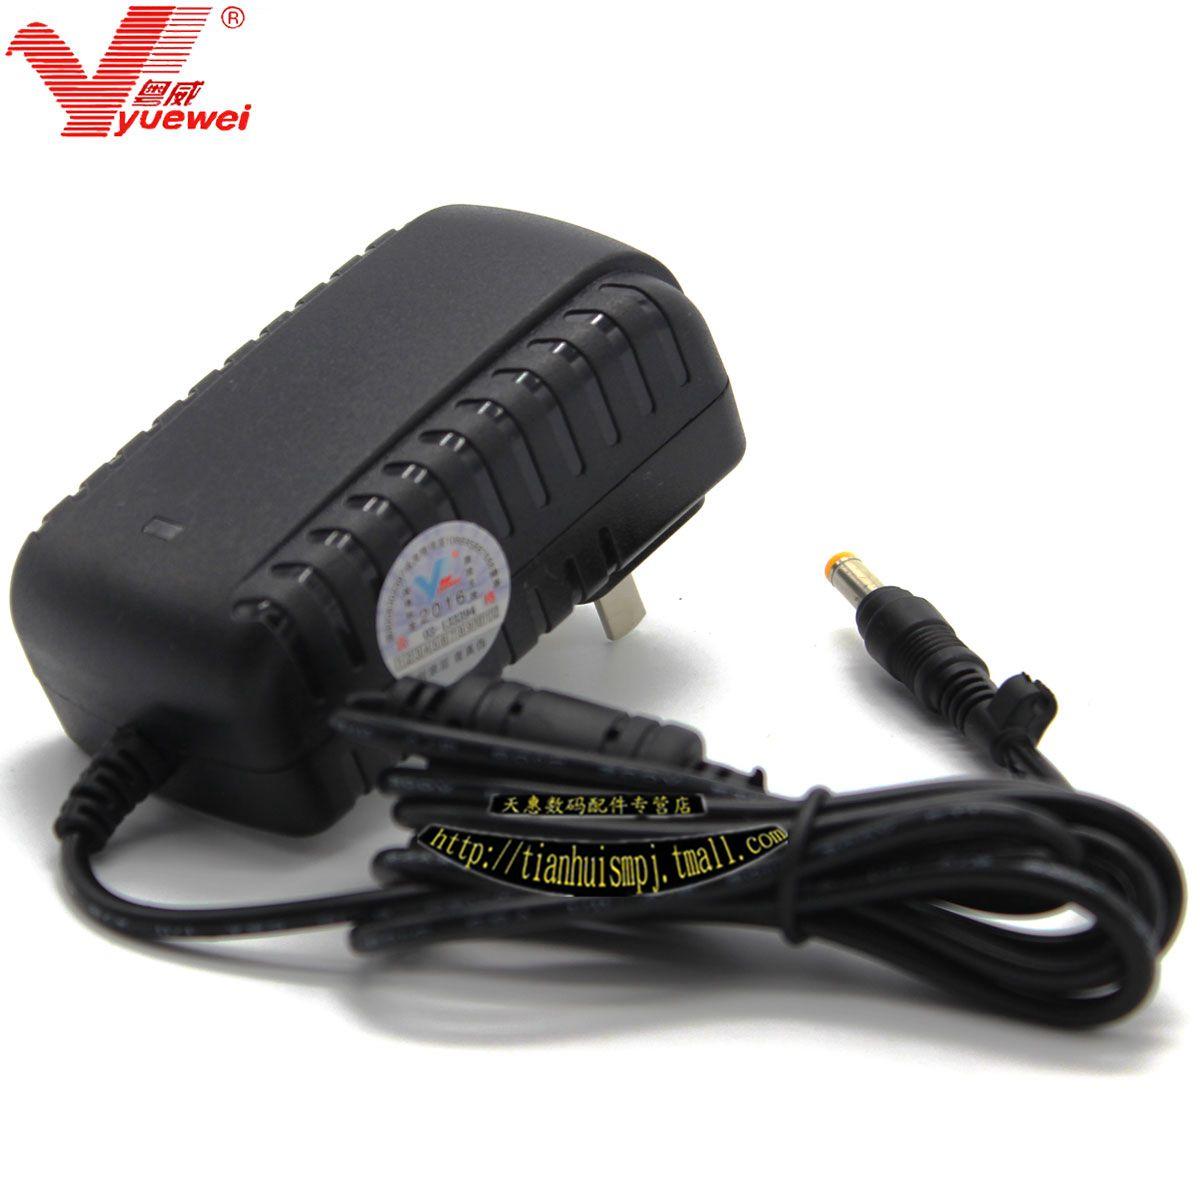 YA-MAN HRF-10T-HK美容仪充电器粤威9V变压器适用HRF-10T-HK电源